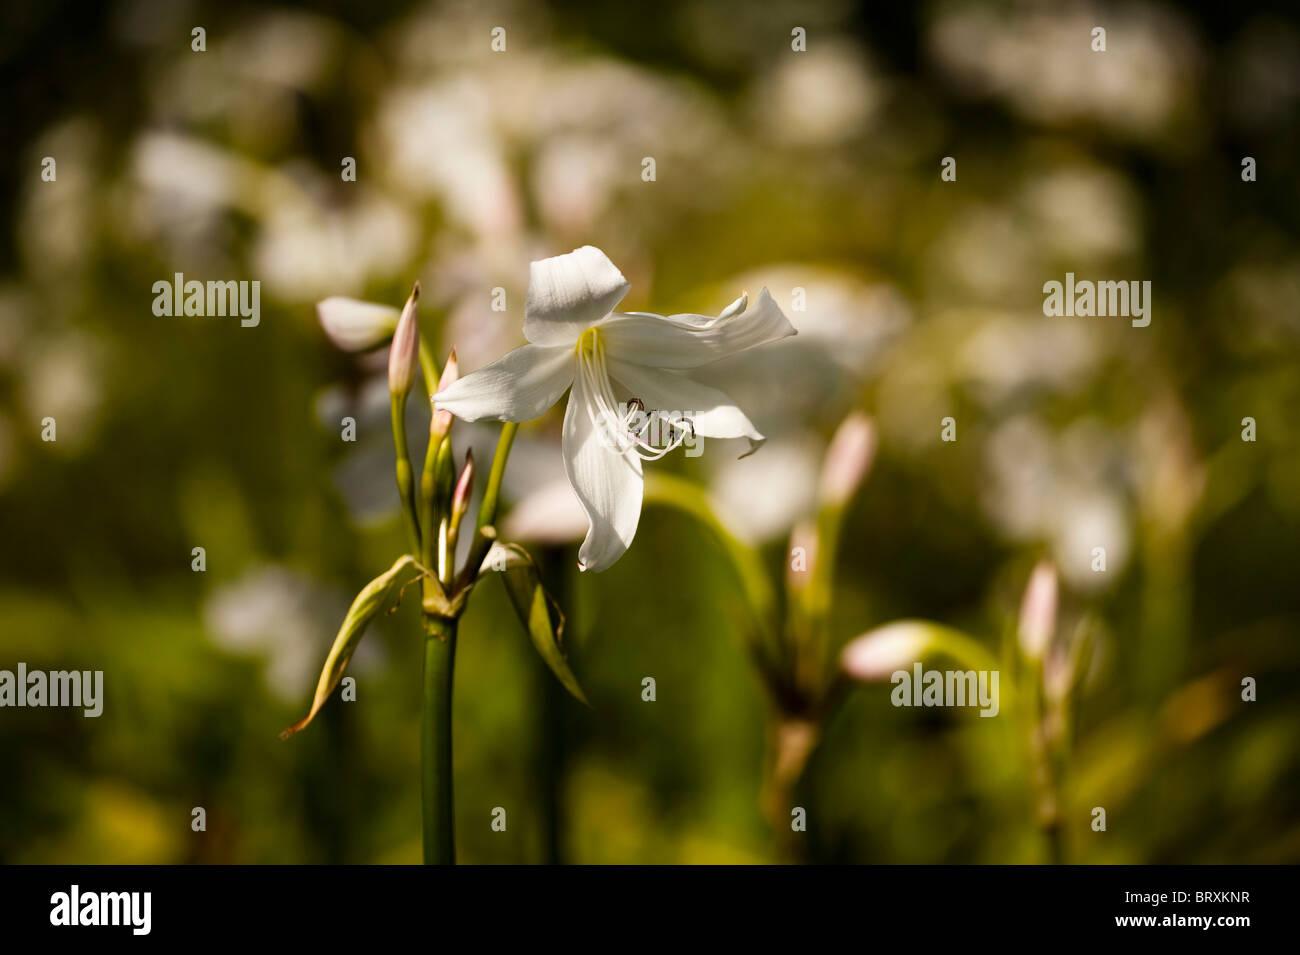 White Powell Lily, Crinum x powellii 'Album' Stock Photo